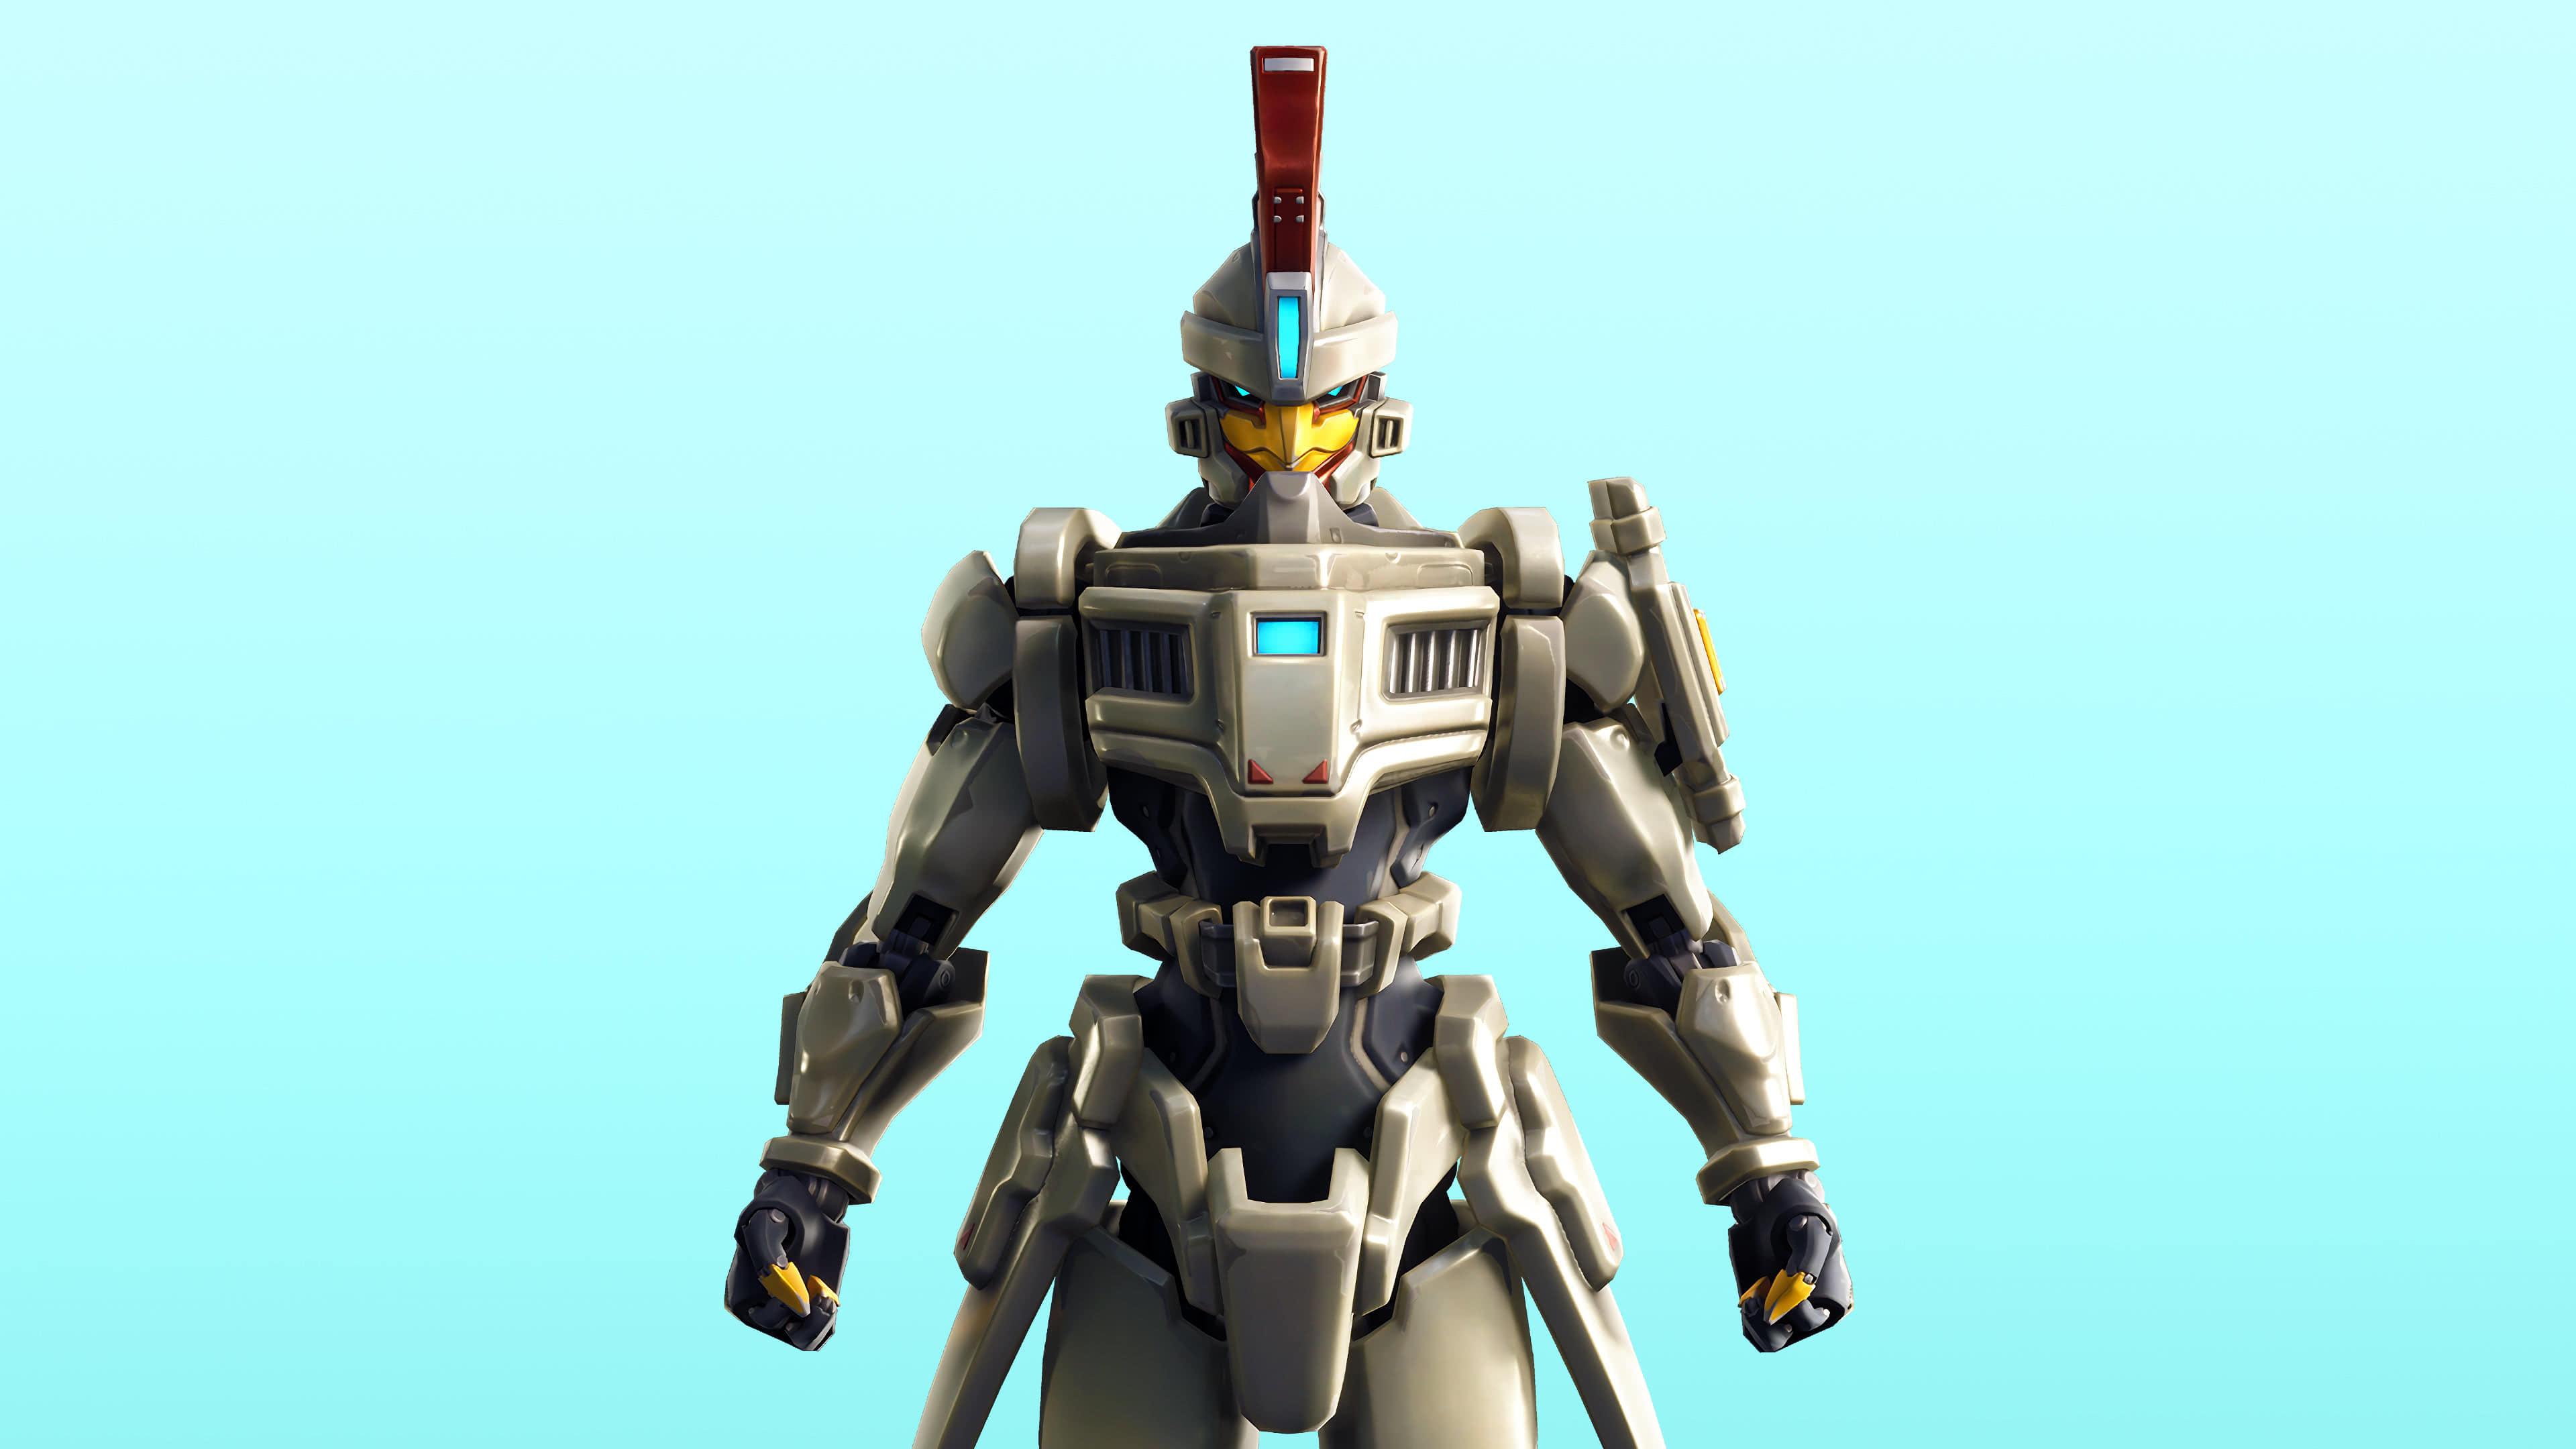 fortnite battle dynamics set sentinel skin outfit uhd 4k wallpaper